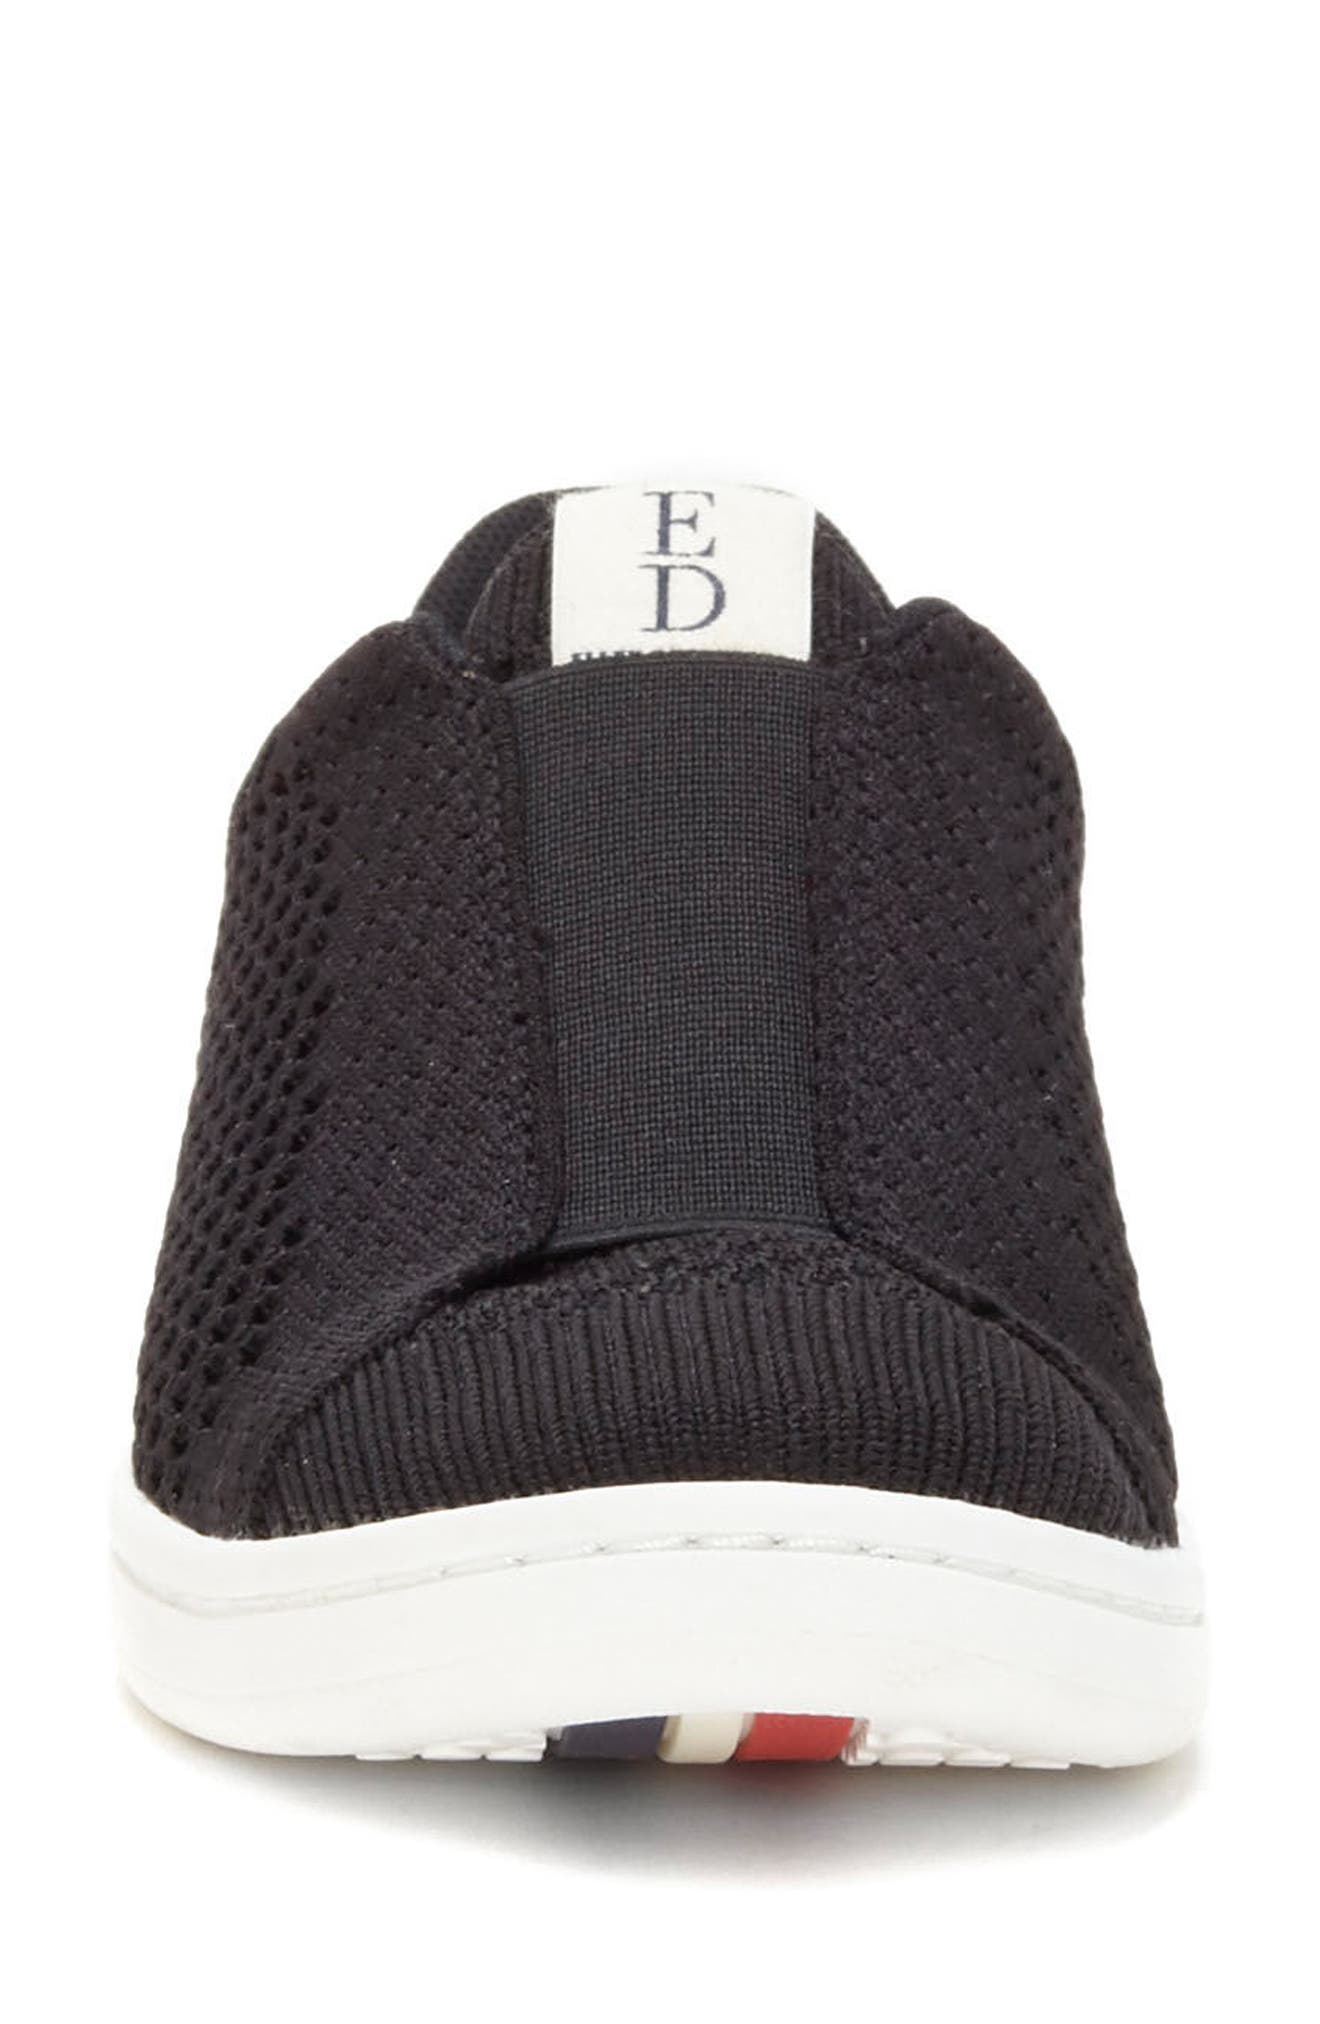 Casbey Slip-On Sneaker,                             Alternate thumbnail 4, color,                             BLACK/ BLACK FABRIC